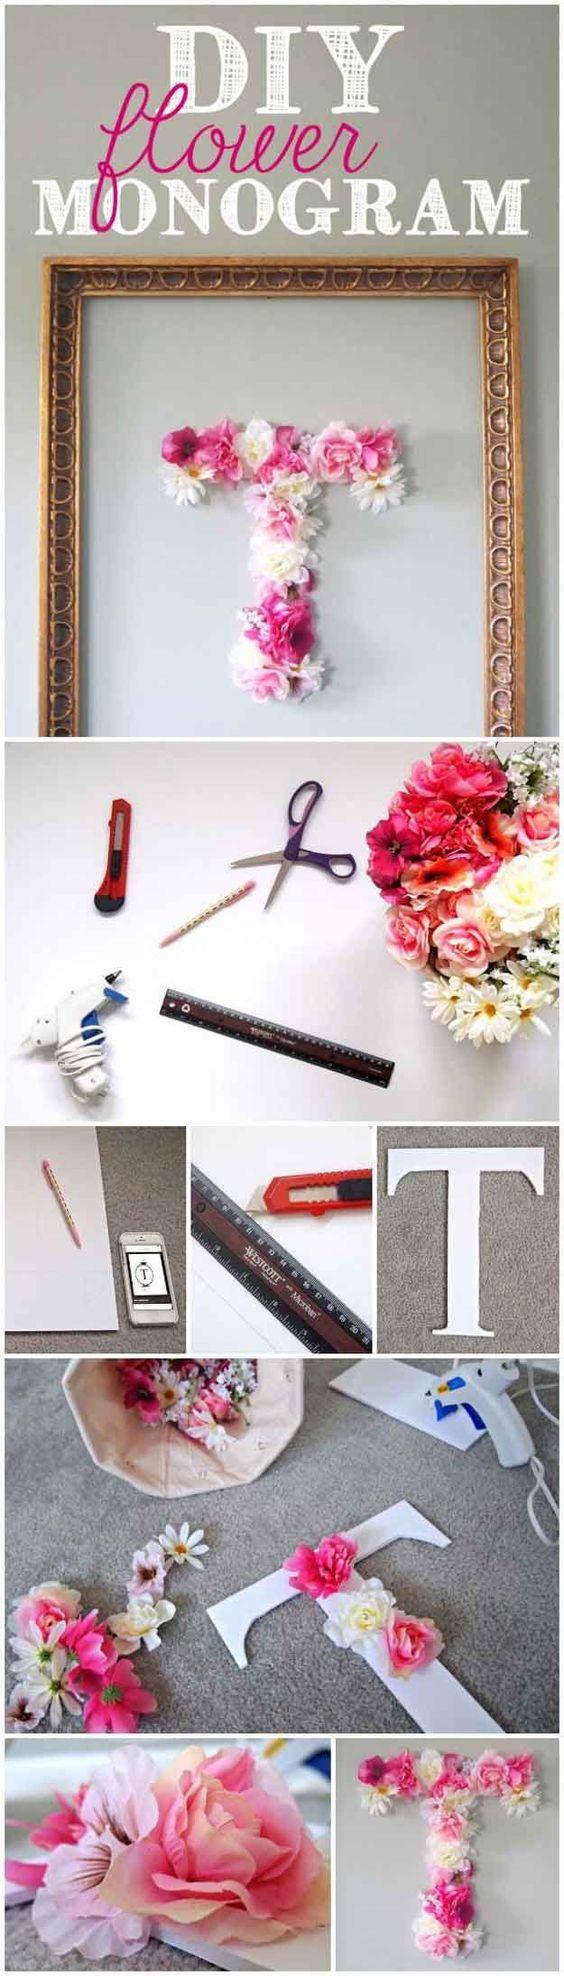 Cool Wall Art Room Decorations for Teen Bedroom   DIY Flower Monogram by DIY…